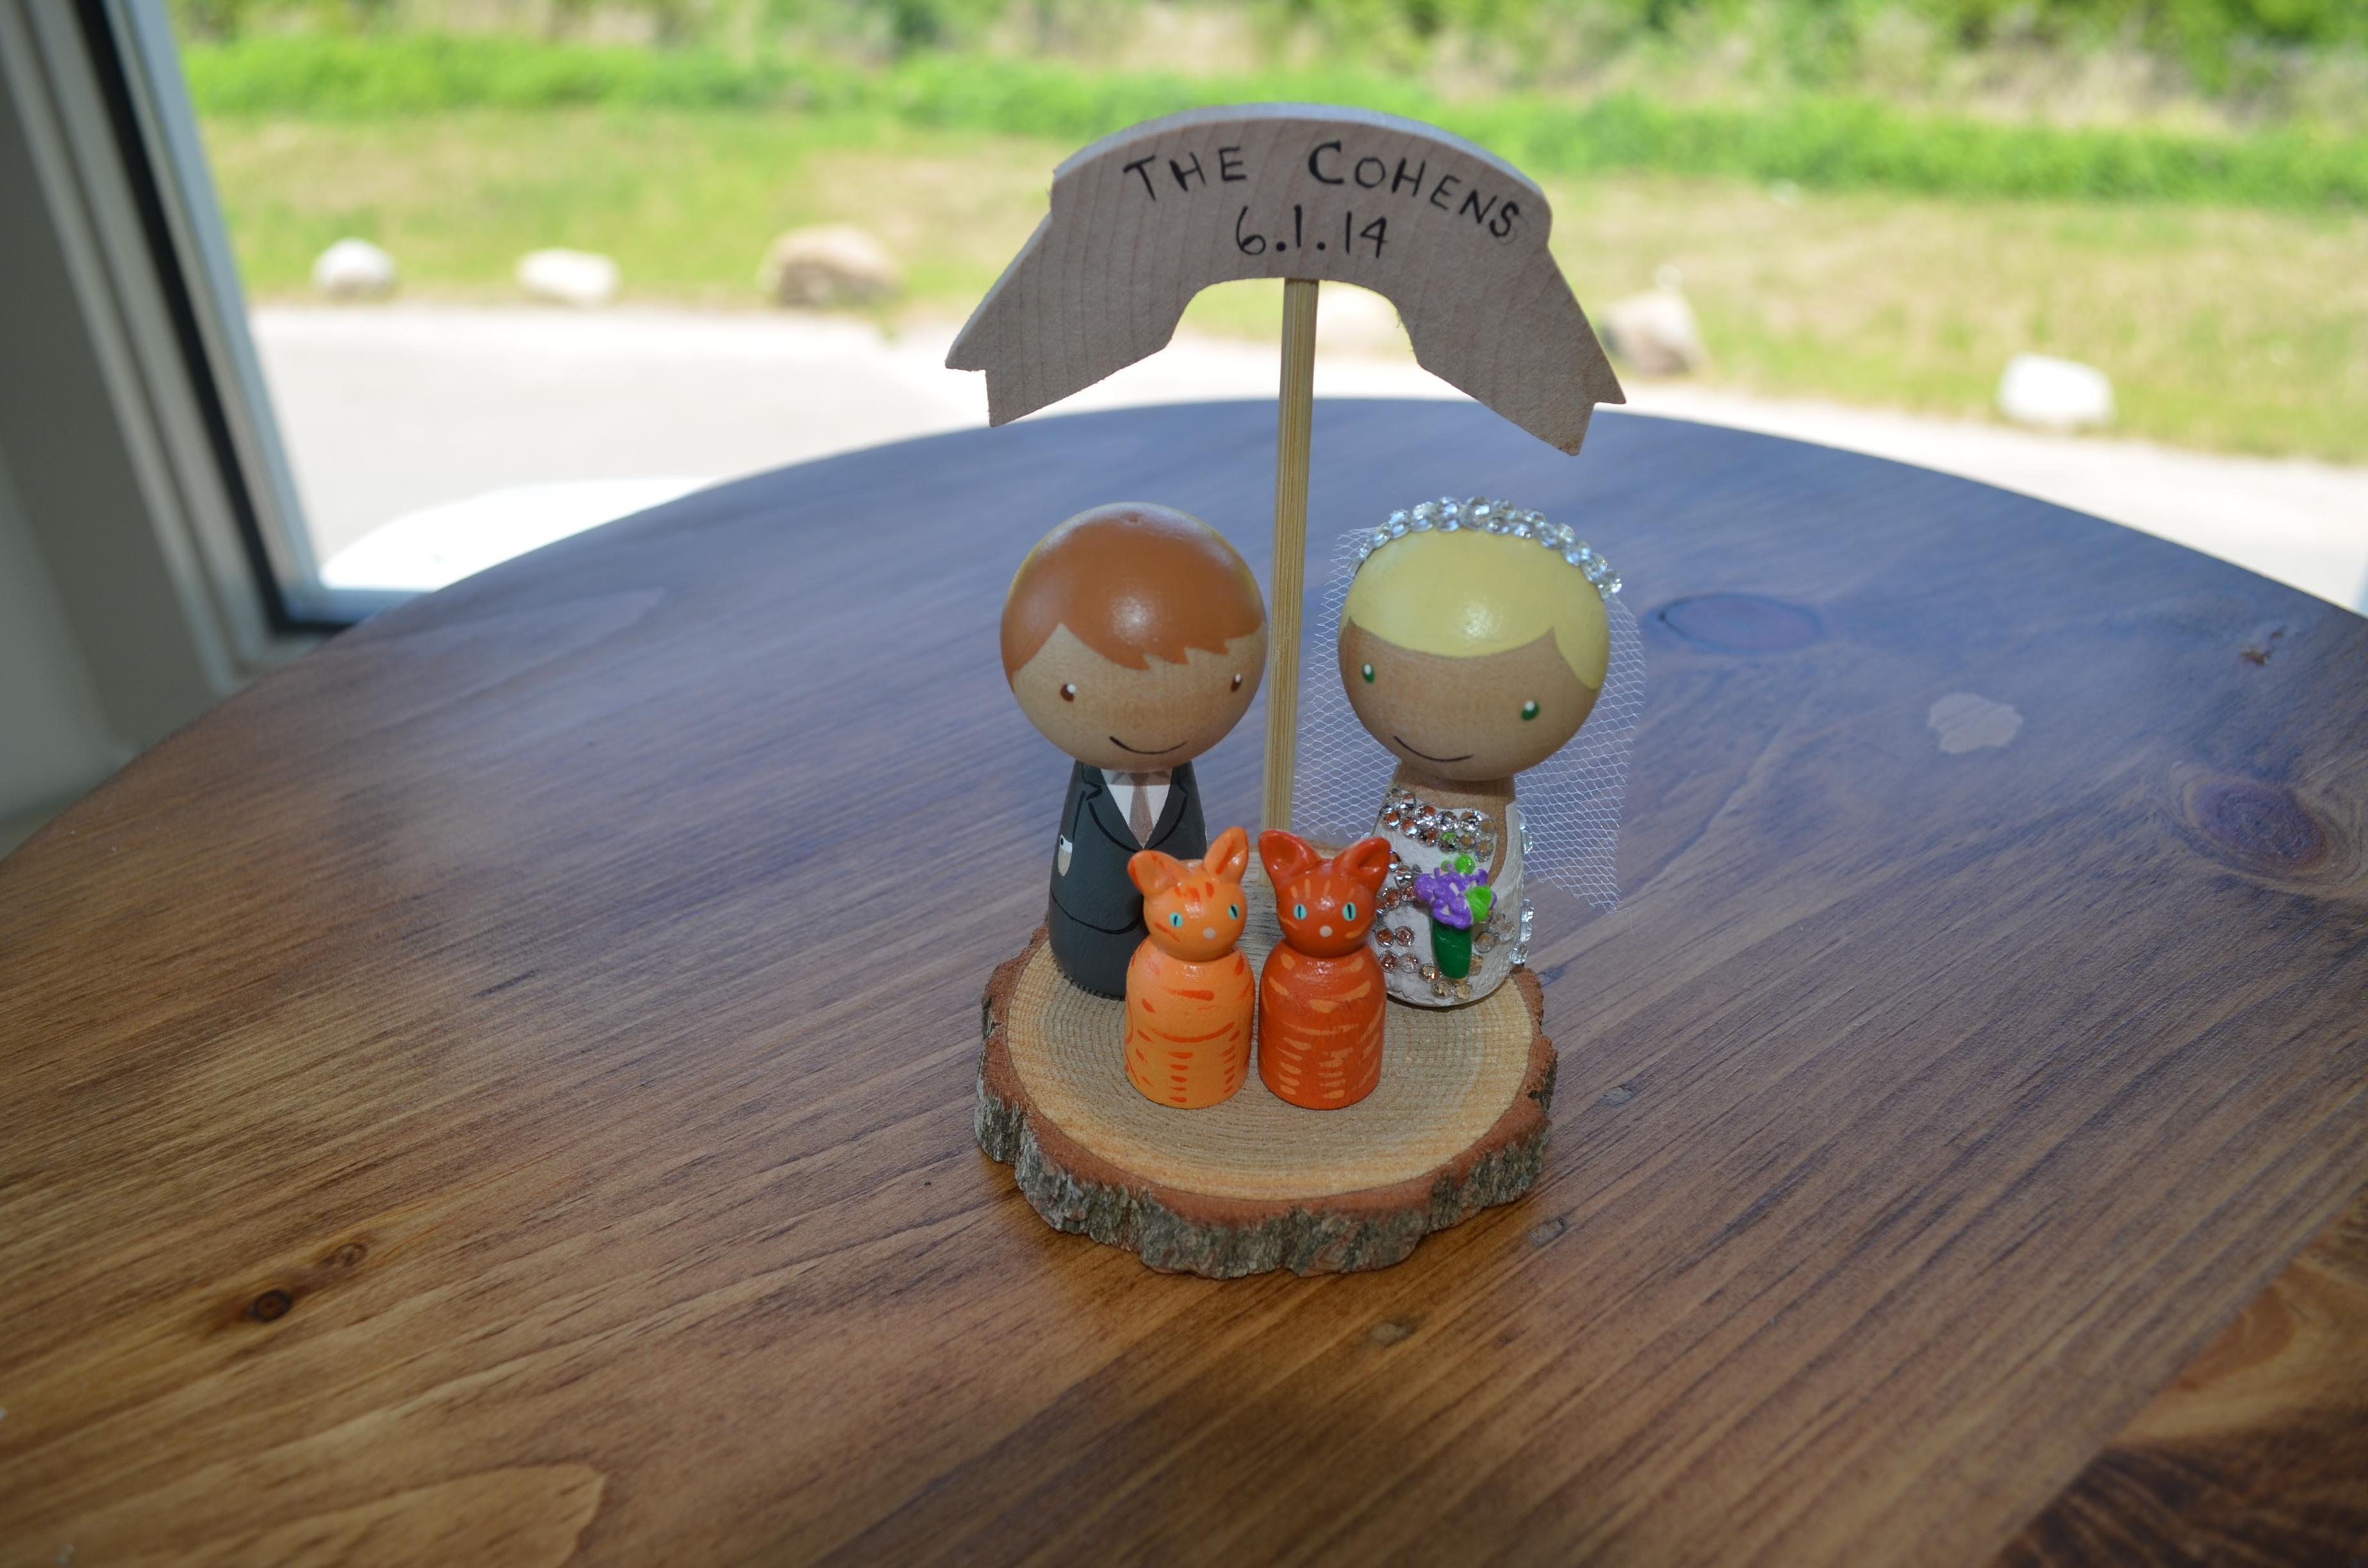 The Garrison Wedding Cake Topper